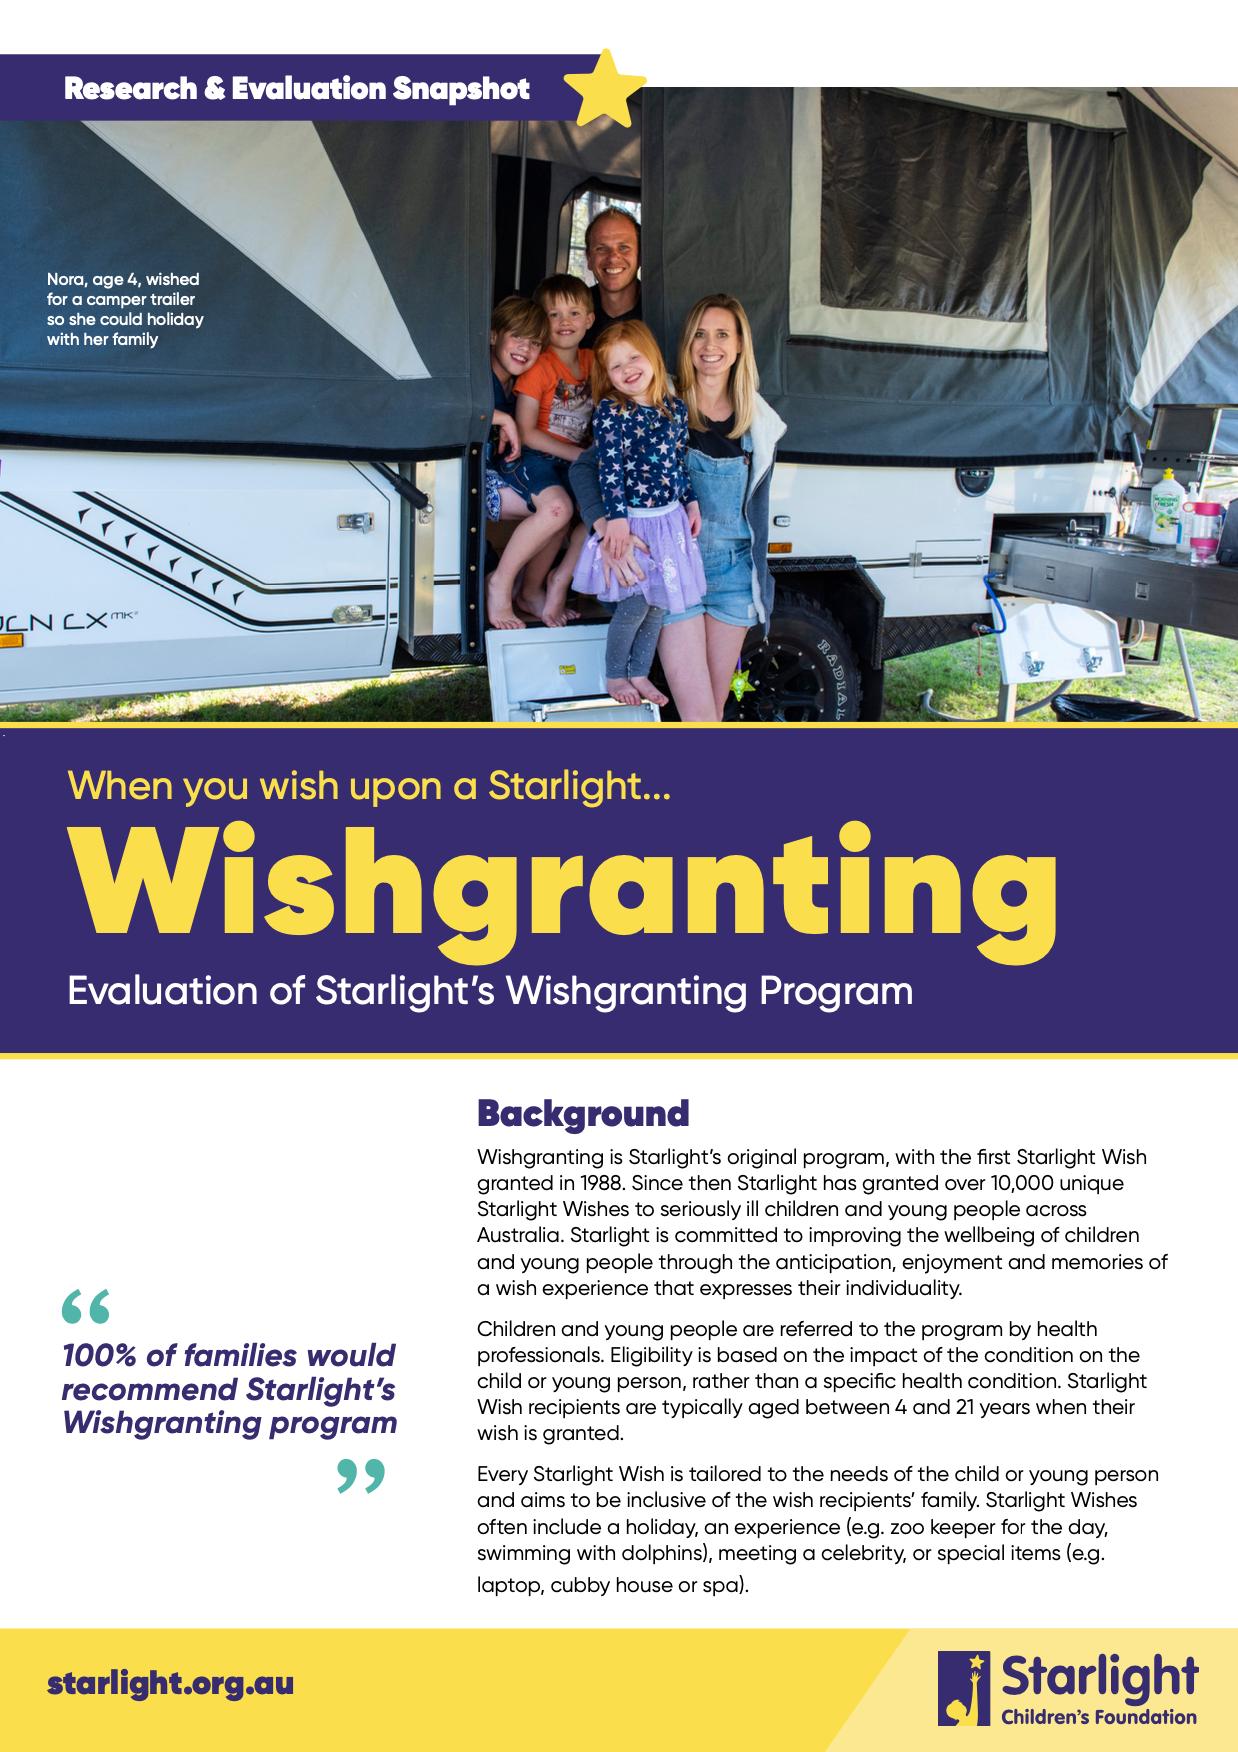 Wishgranting R&E Snapshot